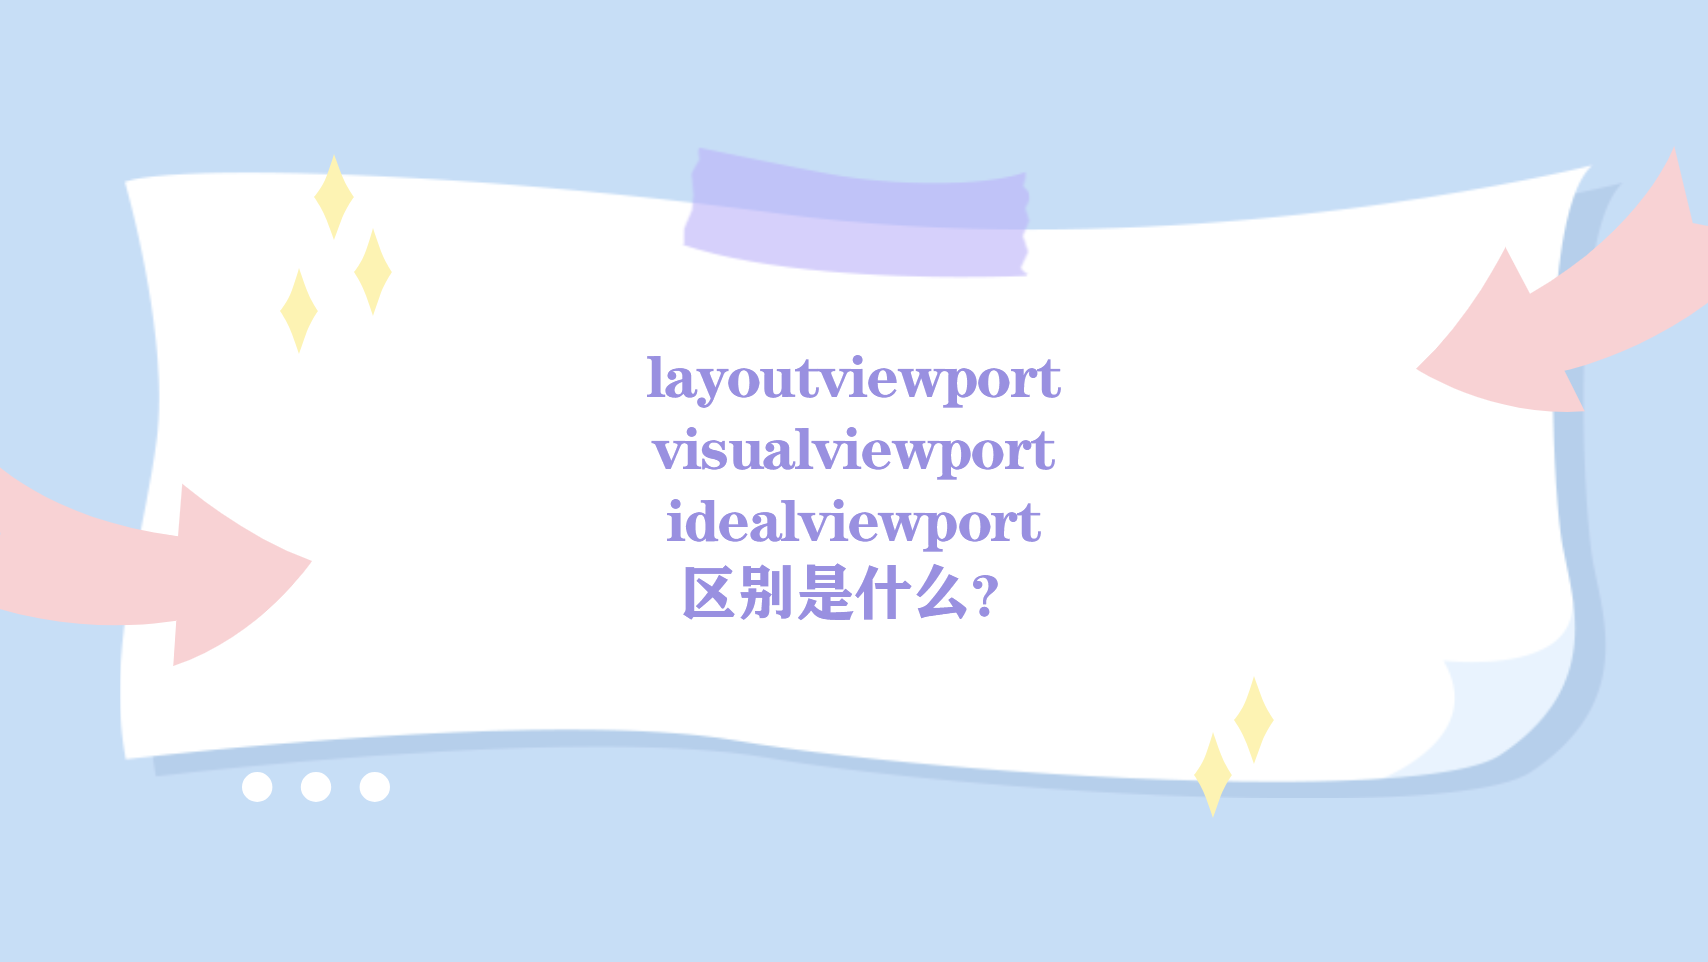 layoutviewport、visualviewport 和 idealviewport 的区别是什么